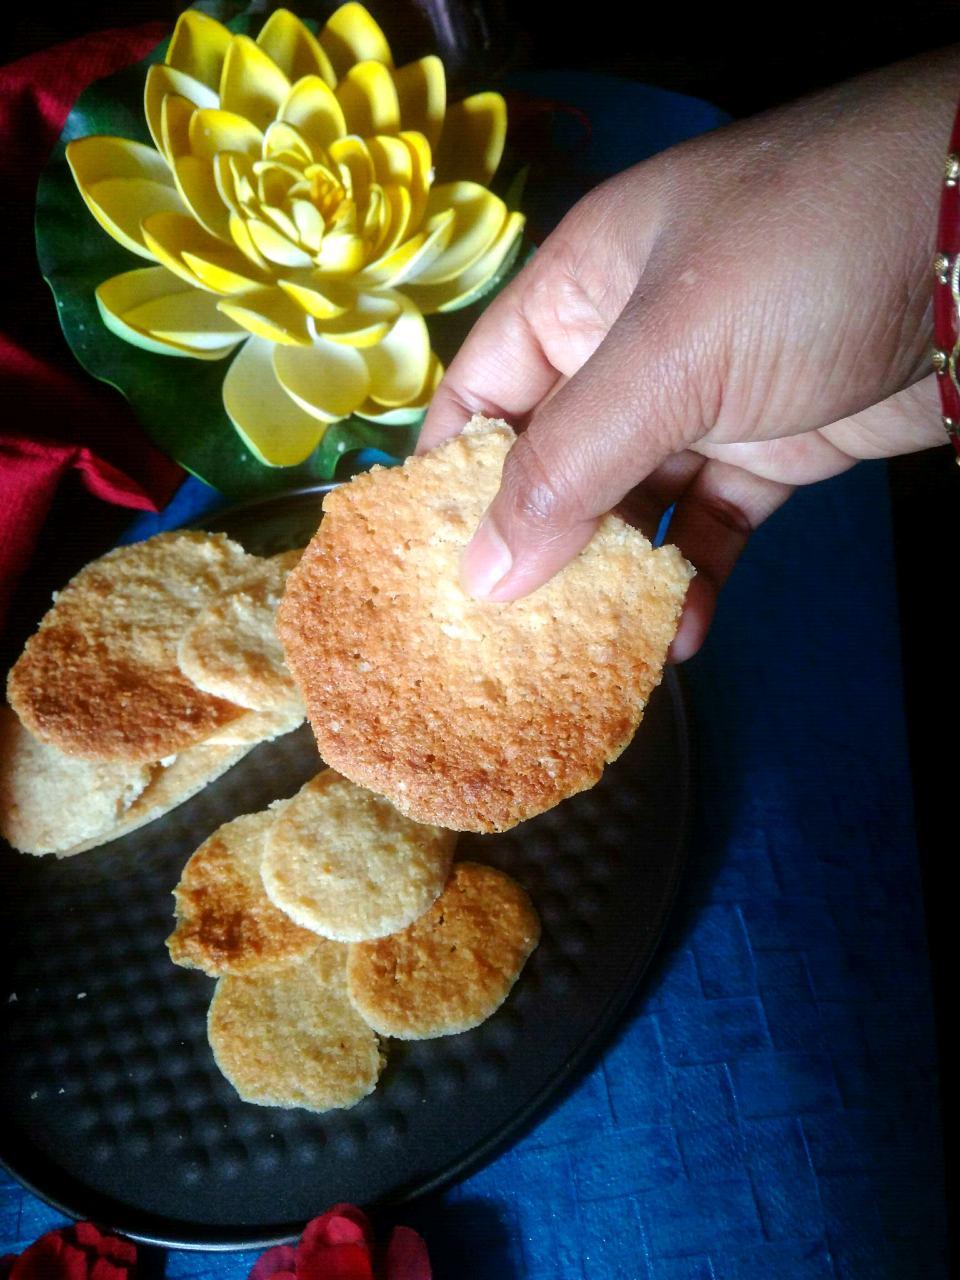 Oats Coconut Biscuit #oldrecipes#wildcard#luck#winchance#topcontributor#surprises